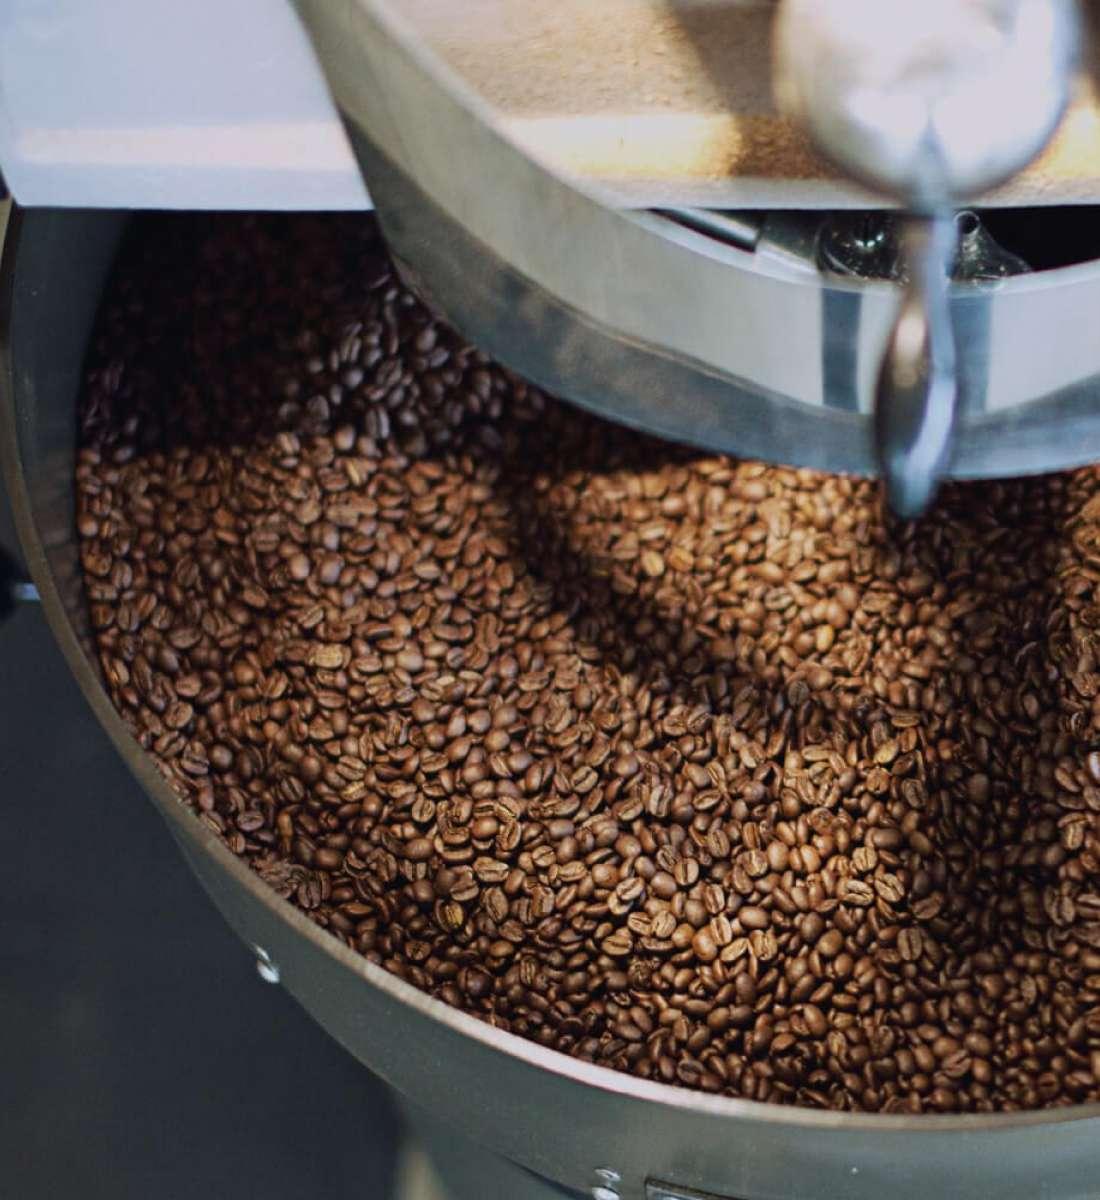 Coava Coffee Roasters - Coffee Roaster, Subscriptions, Shop